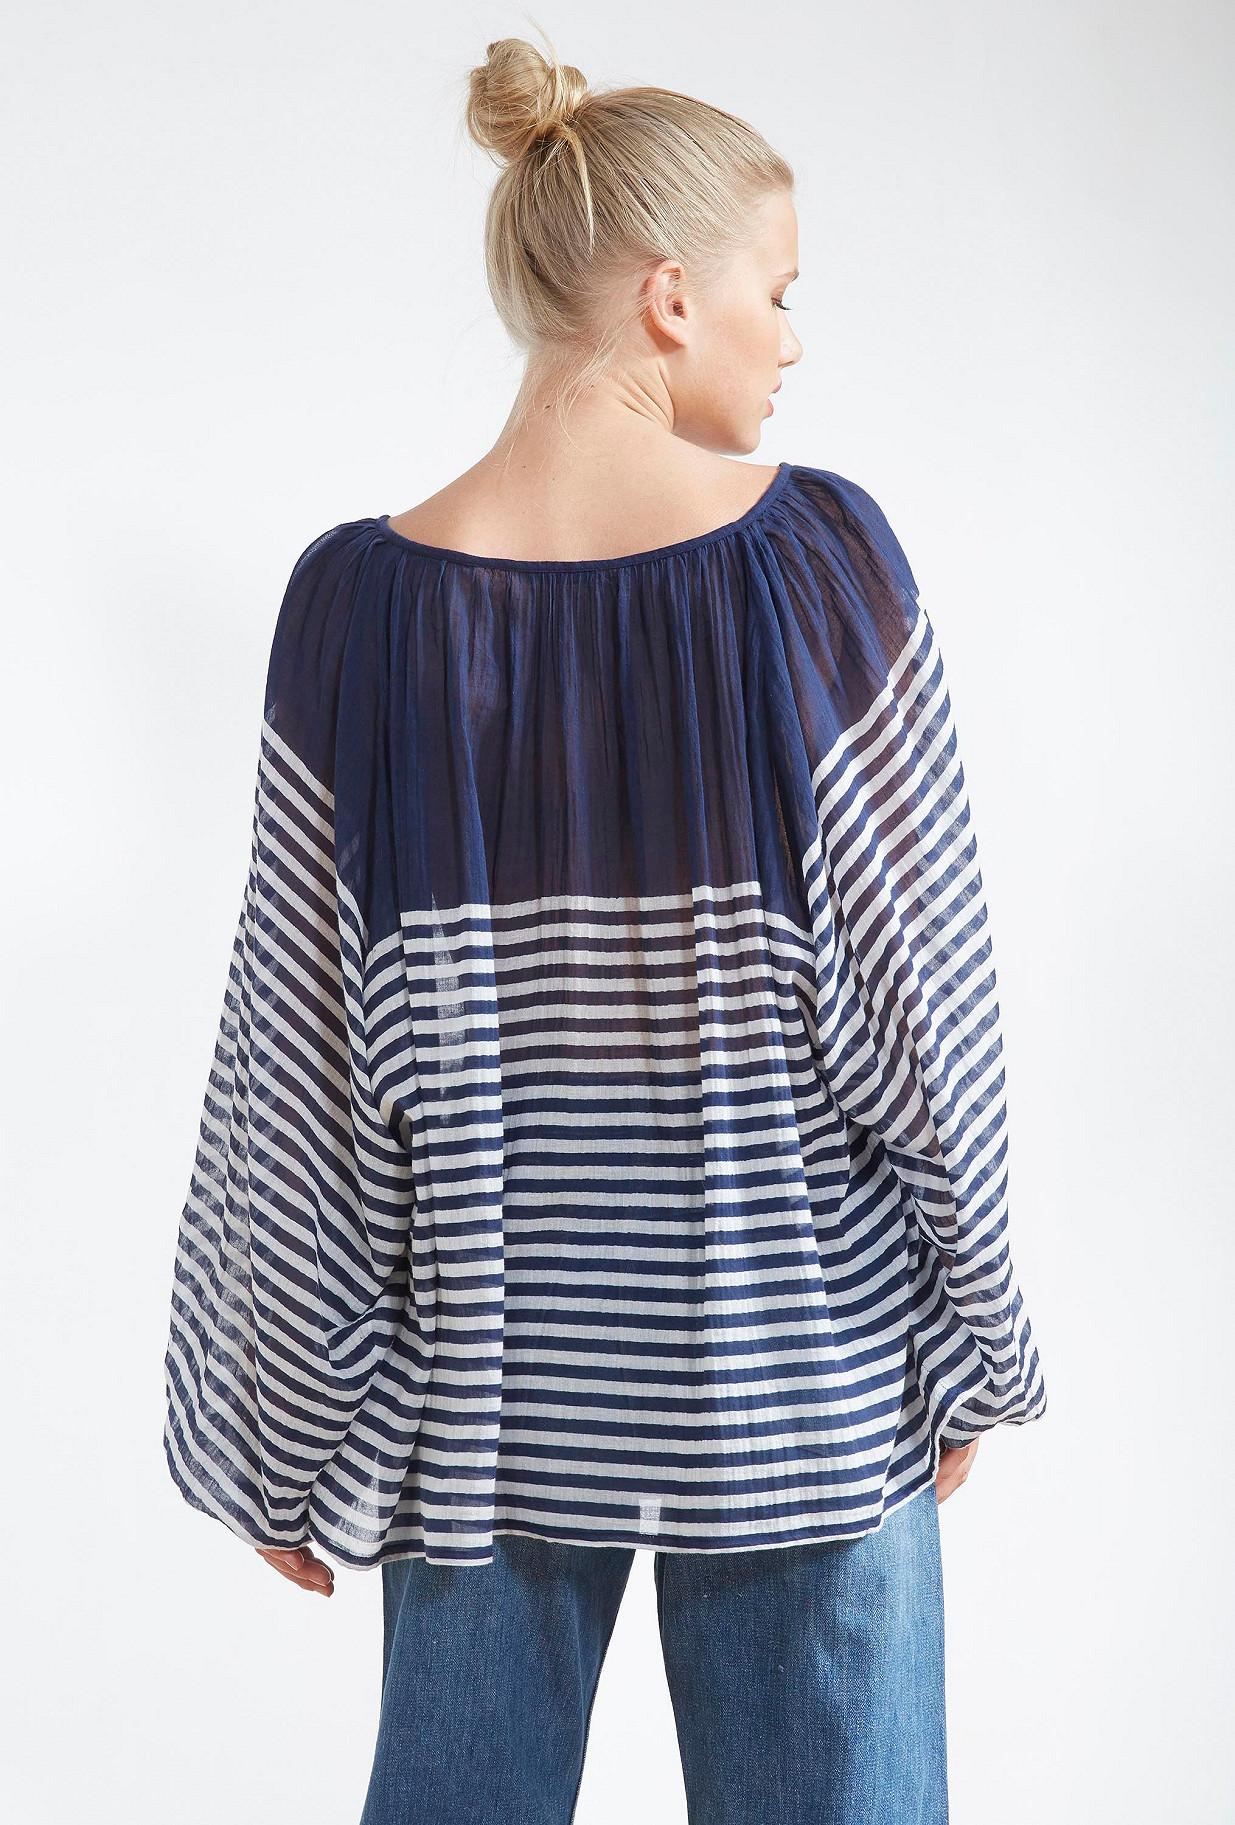 clothes store BLOUSE  Forward french designer fashion Paris